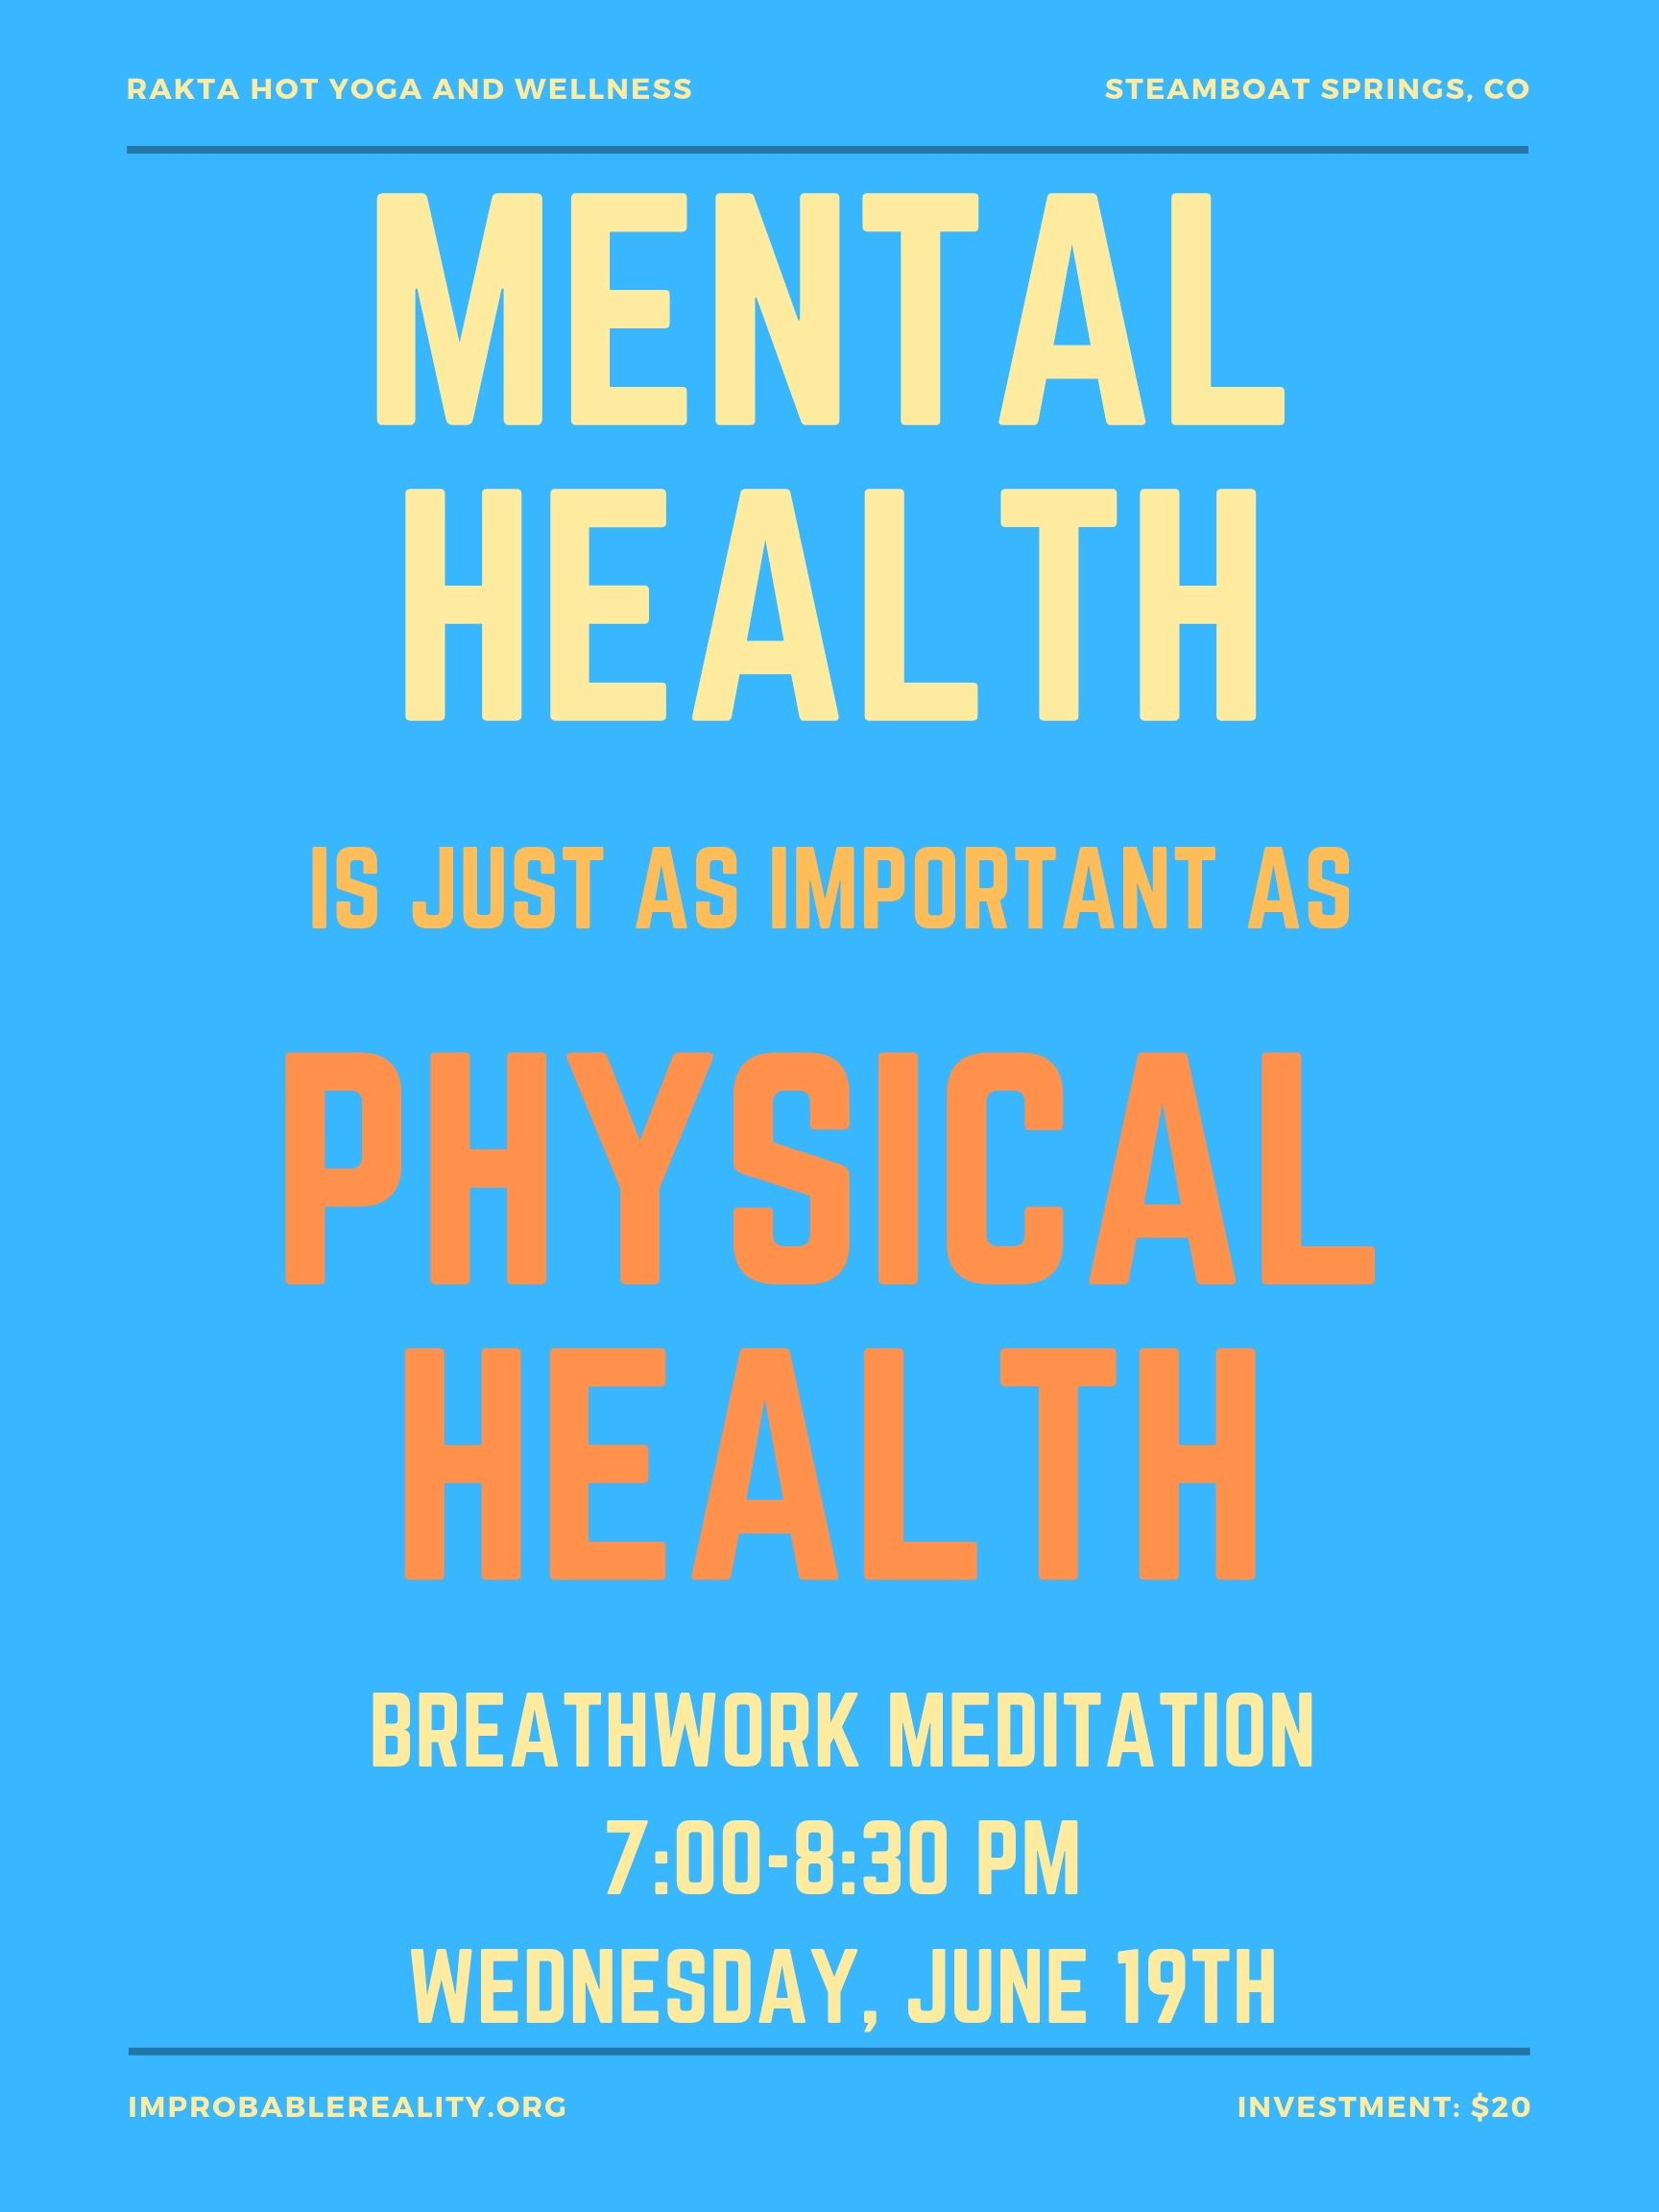 Breathwork Healing Meditation